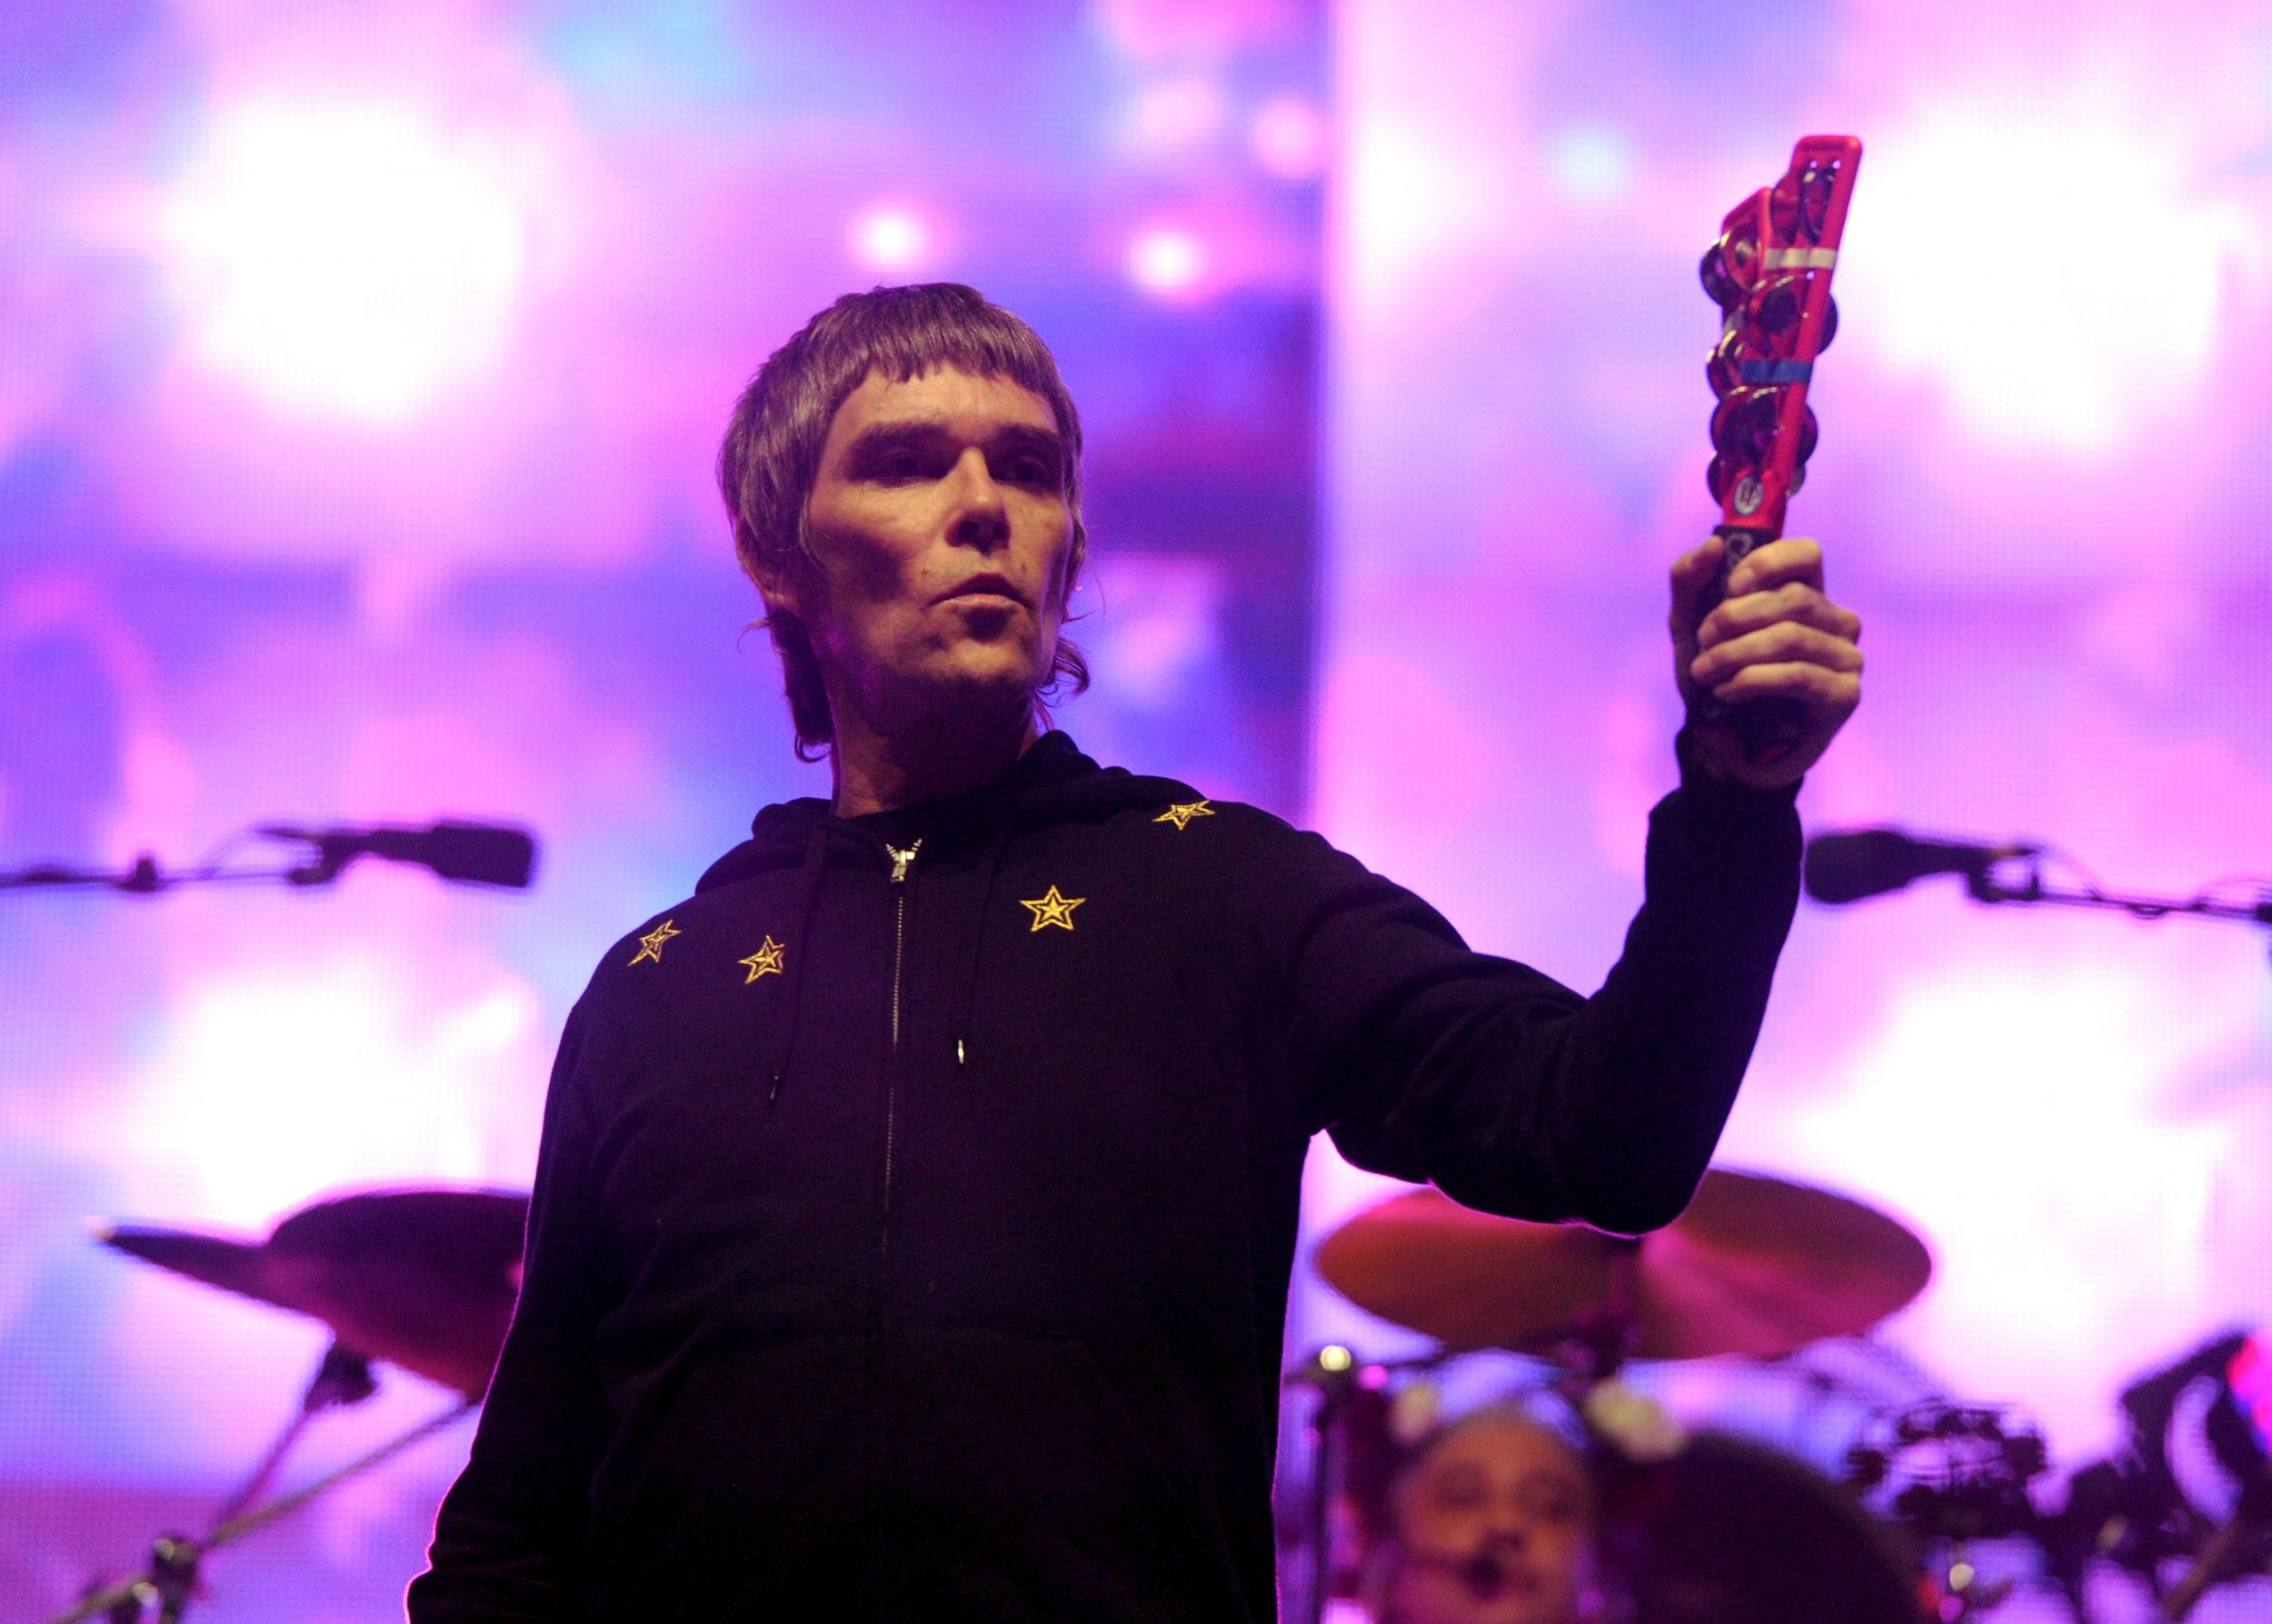 Stone Roses frontman Ian Brown at Coachella